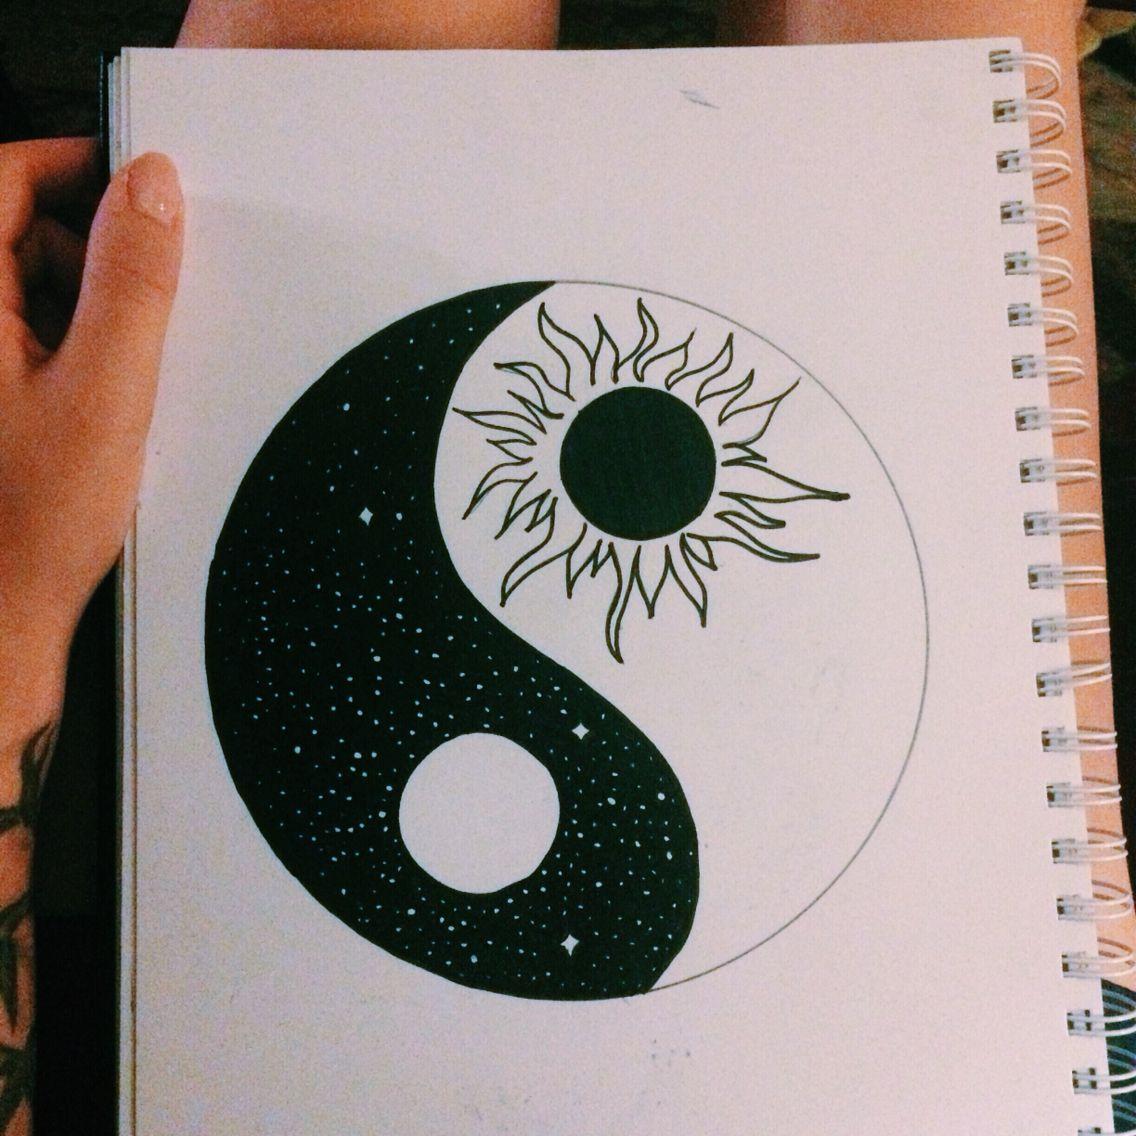 Pinterest cleodallas insta cleotillman arte pinterest ying yang sun and moon mehr buycottarizona Image collections